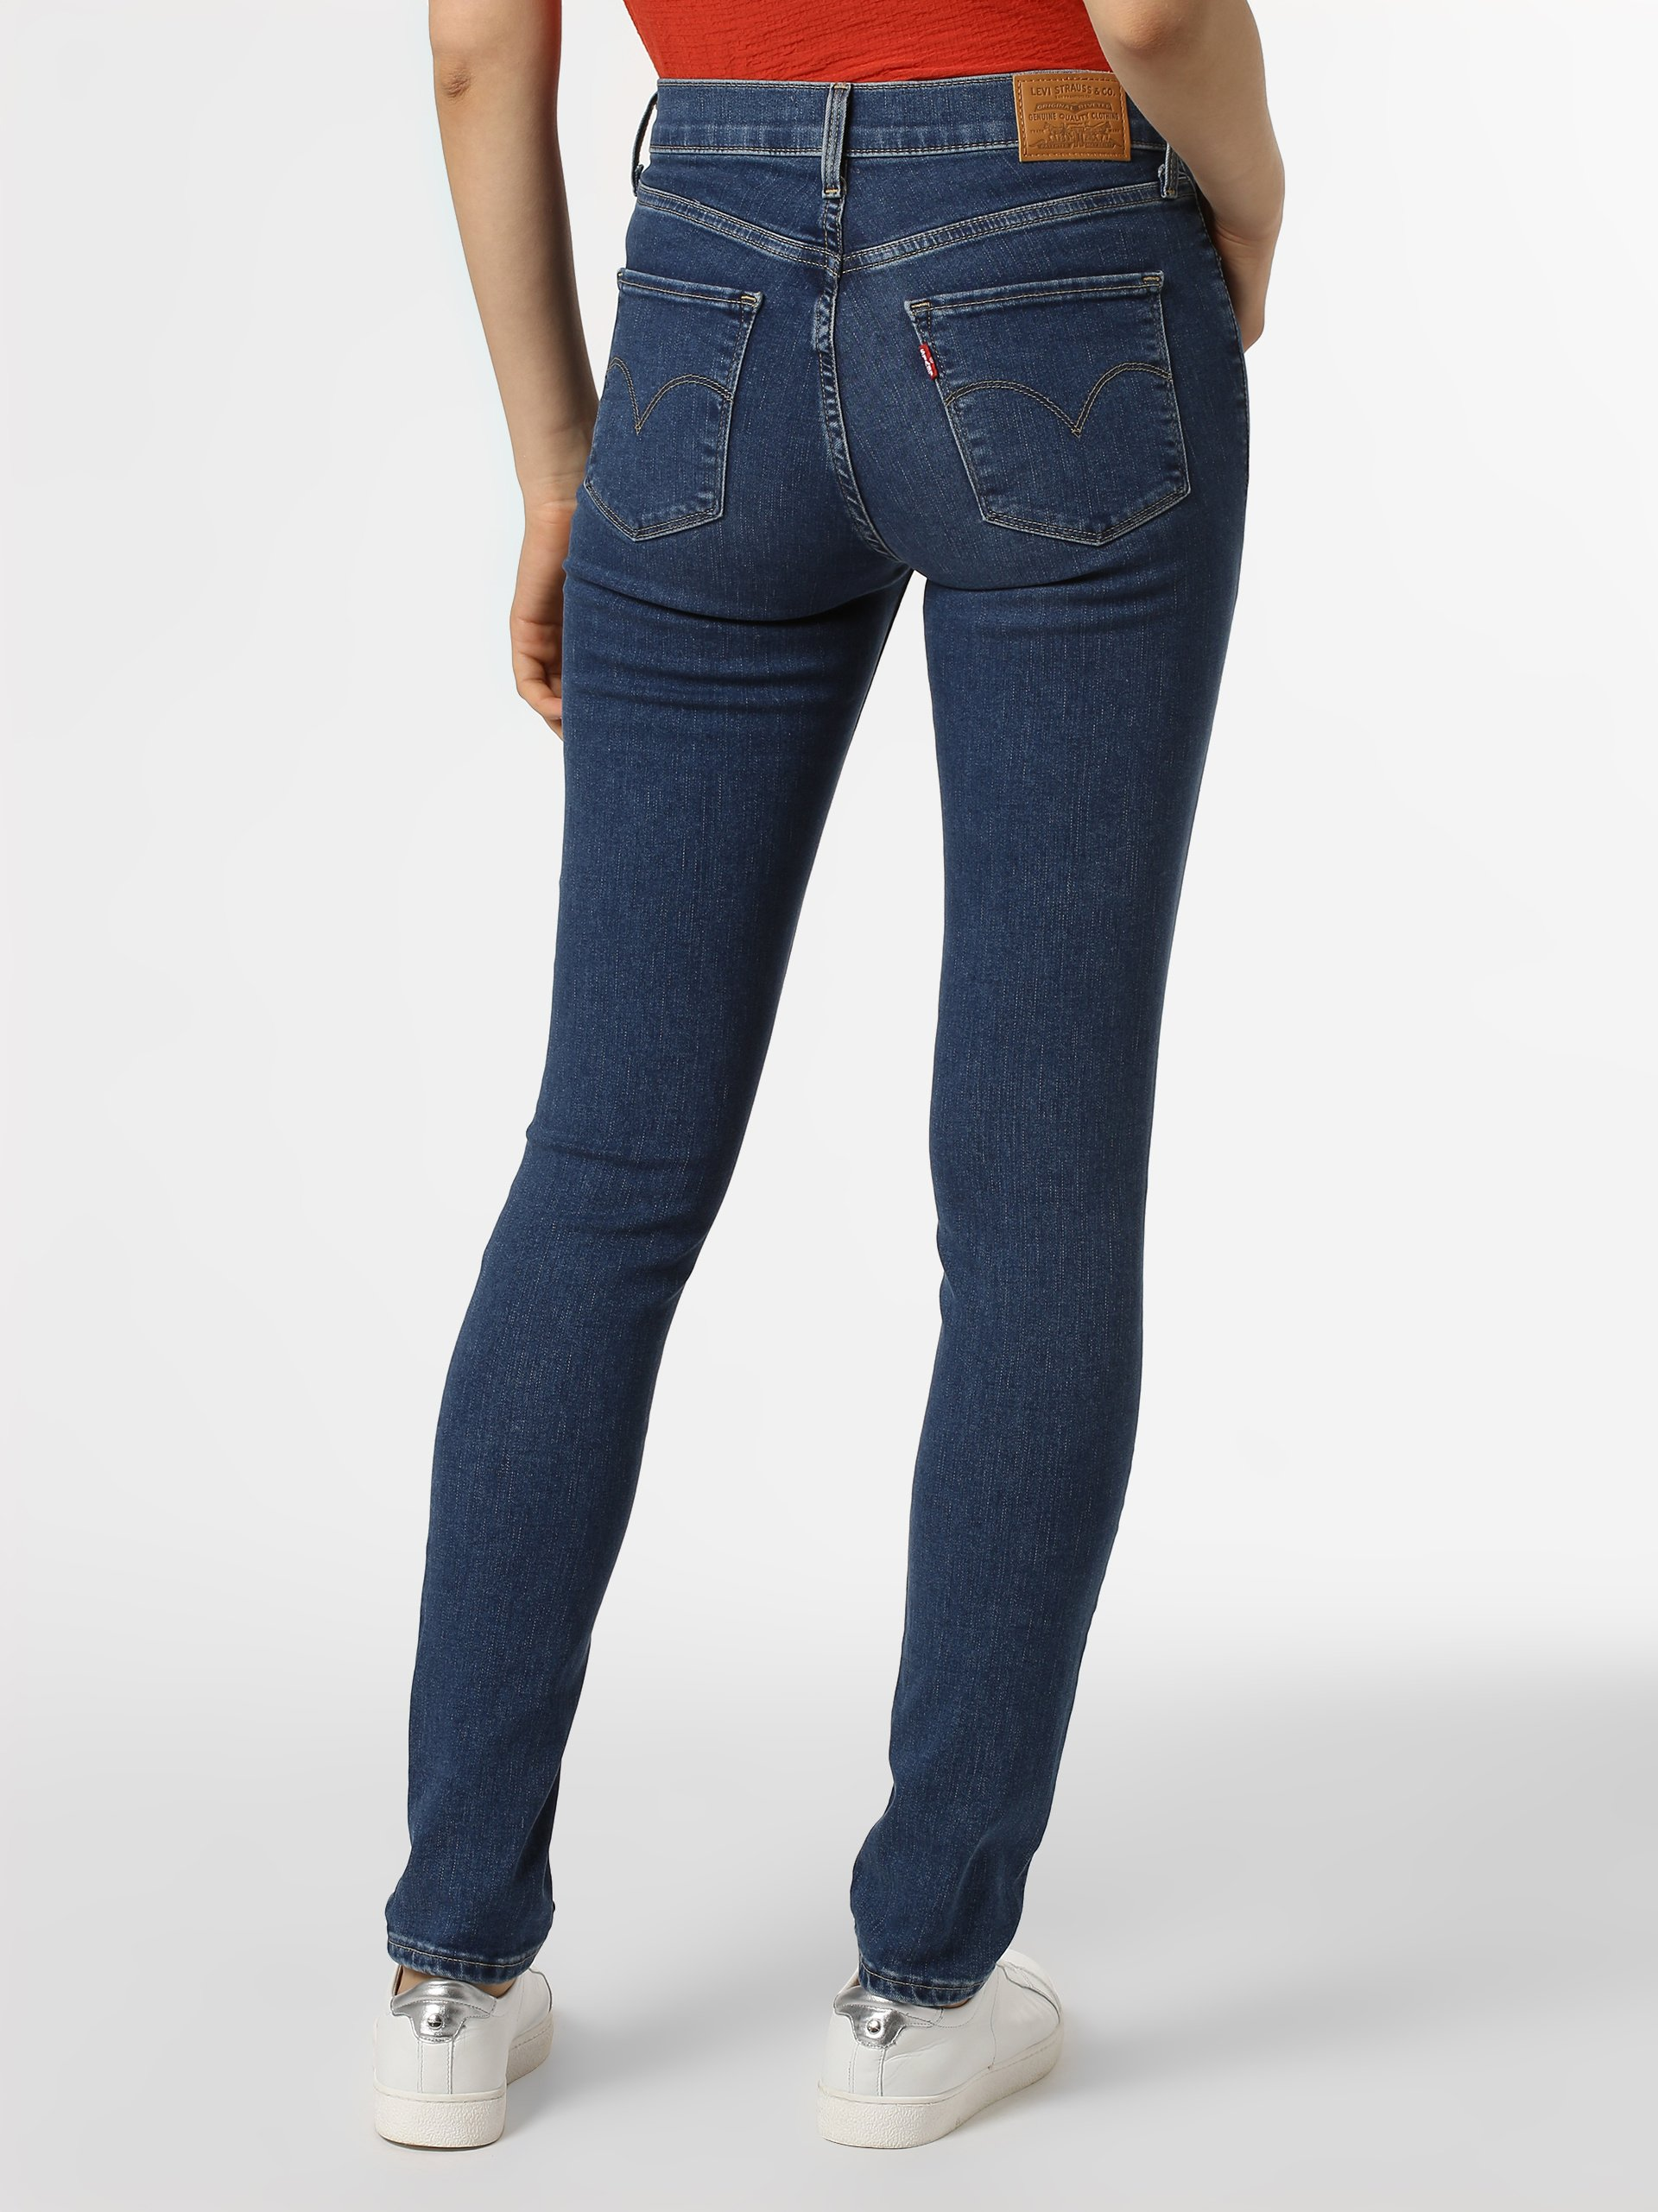 Levi\'s Damen Jeans - 311™ Shaping Skinny